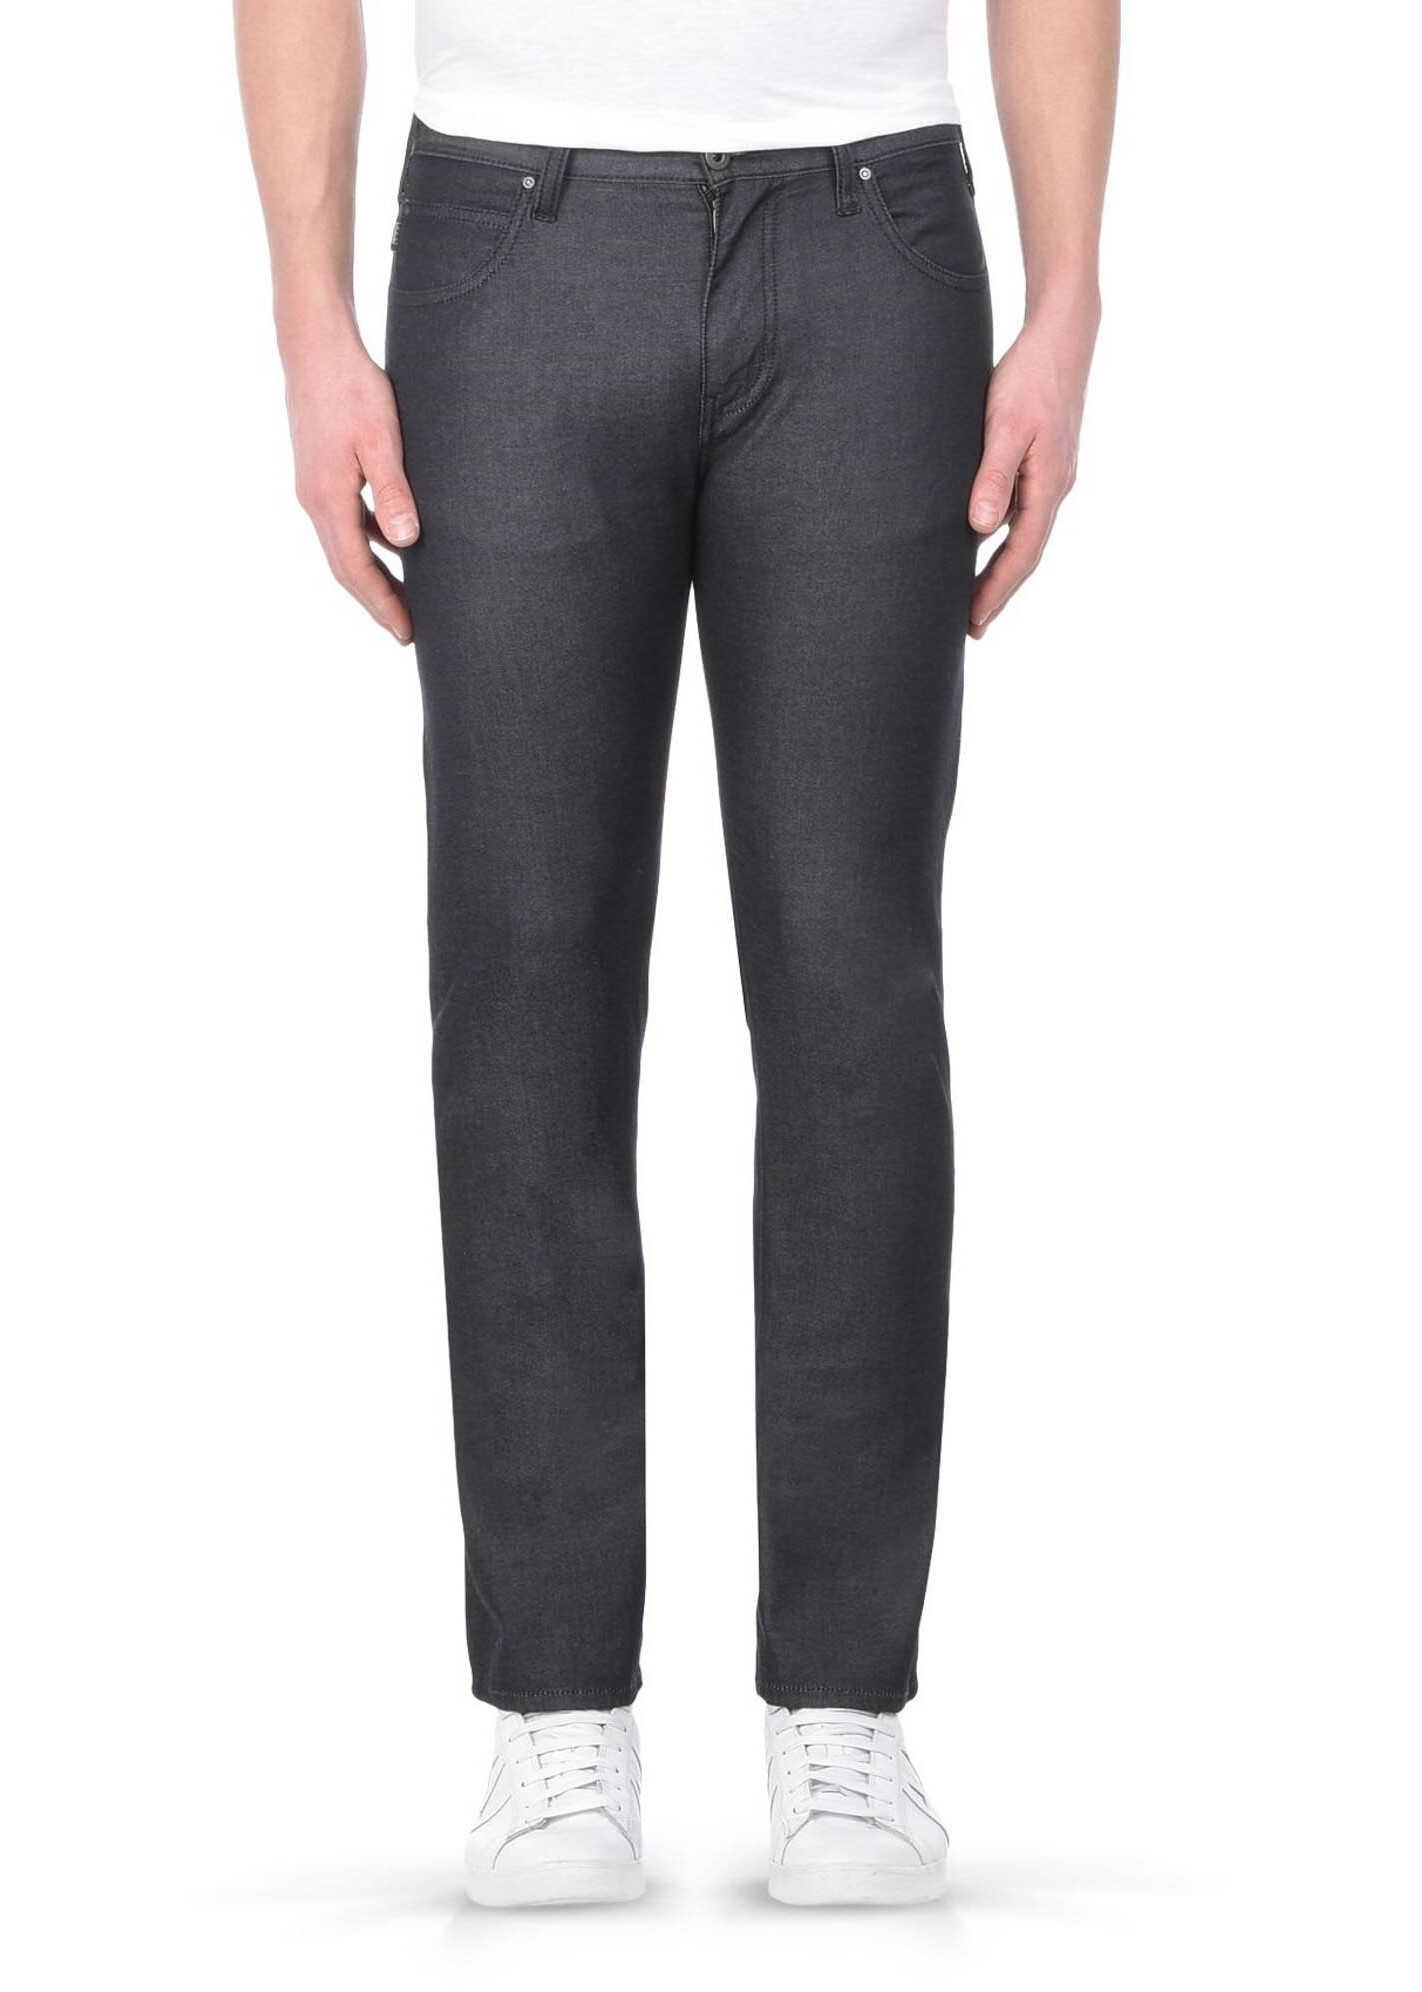 Blugi Barbati Armani Jeans 1ae82891 Black